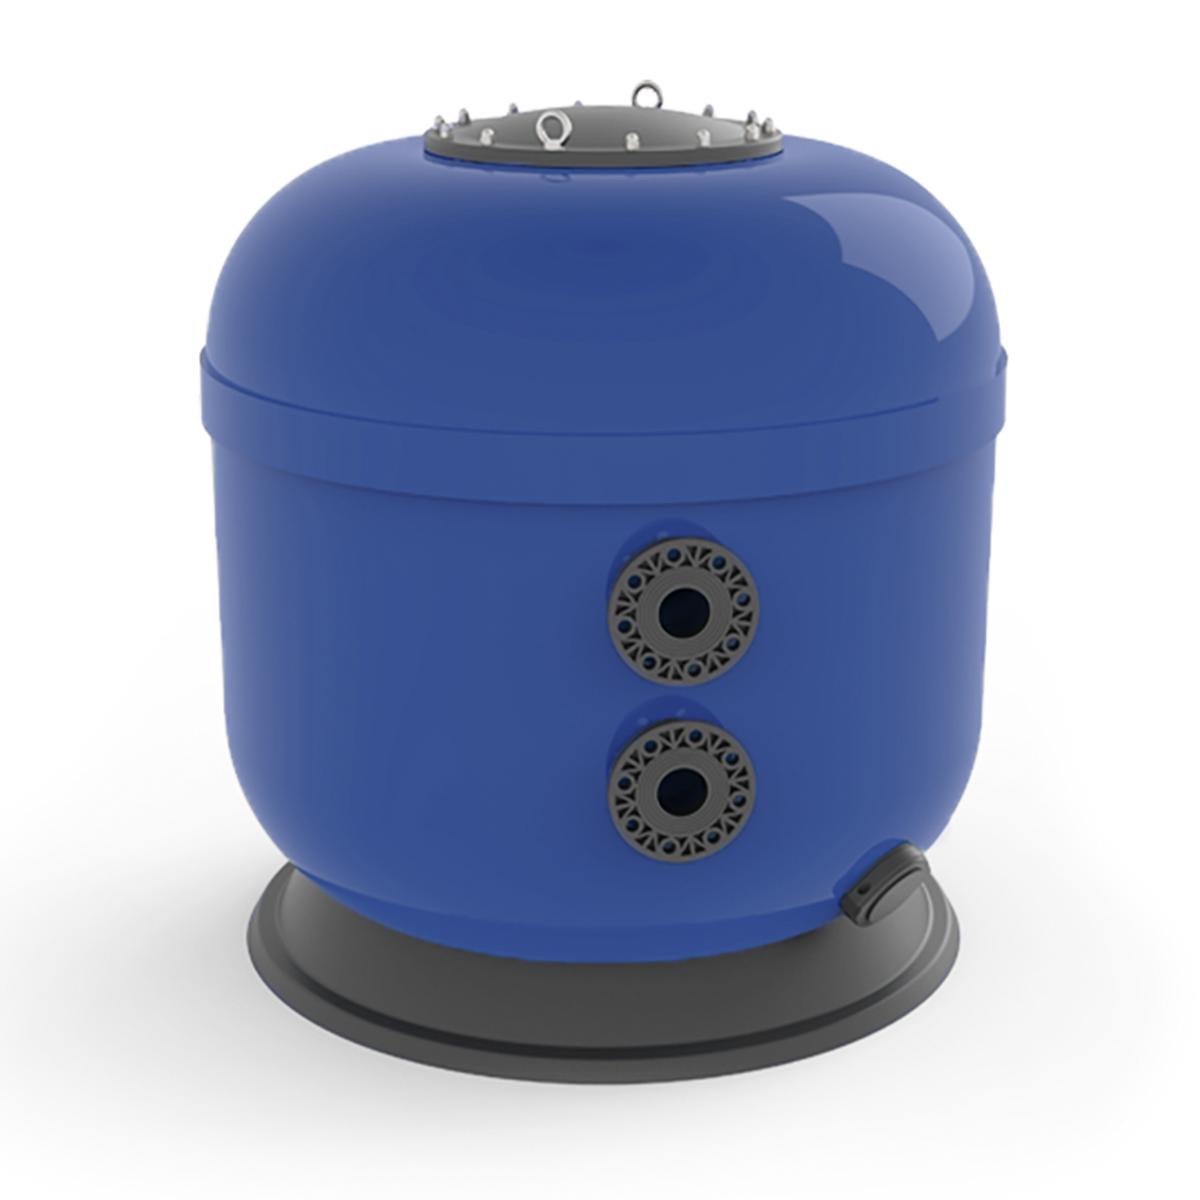 "Polyester Filter VIENNA II laminiert, side mount, blau, d950, GFK Deckel 400 mm schwarz inkl. 1"" Spülanschluss, Ablass d75 mm inkl. 1"" Entleerungsstopfen, Filtermediumhöhe 800 mm, PVC Flanschanschluss d75 mm Polyester Filter VIENNA II laminiert, side mount, blau, d950, GFK Deckel 400 mm schwarz inkl. 1"" Spülanschluss, Ablass d75 mm inkl. 1"" Entleerungsstopfen, Filtermediumhöhe 800 mm, PVC Flanschanschluss d75 mm"